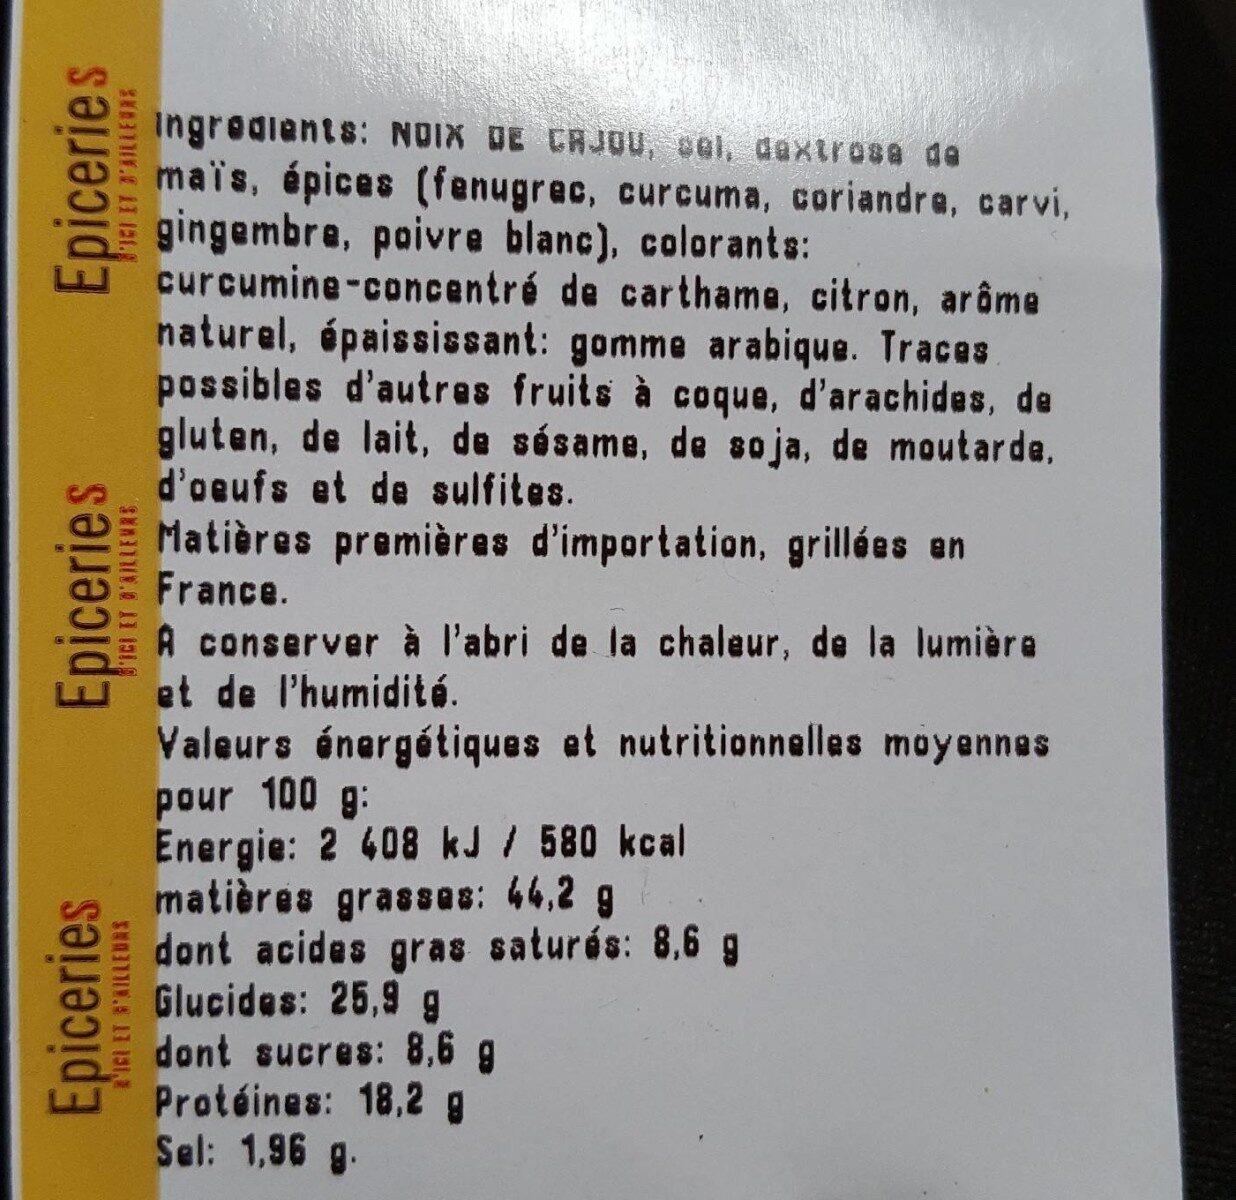 Noix de cajou grillées aromatisées curry - Ingrediënten